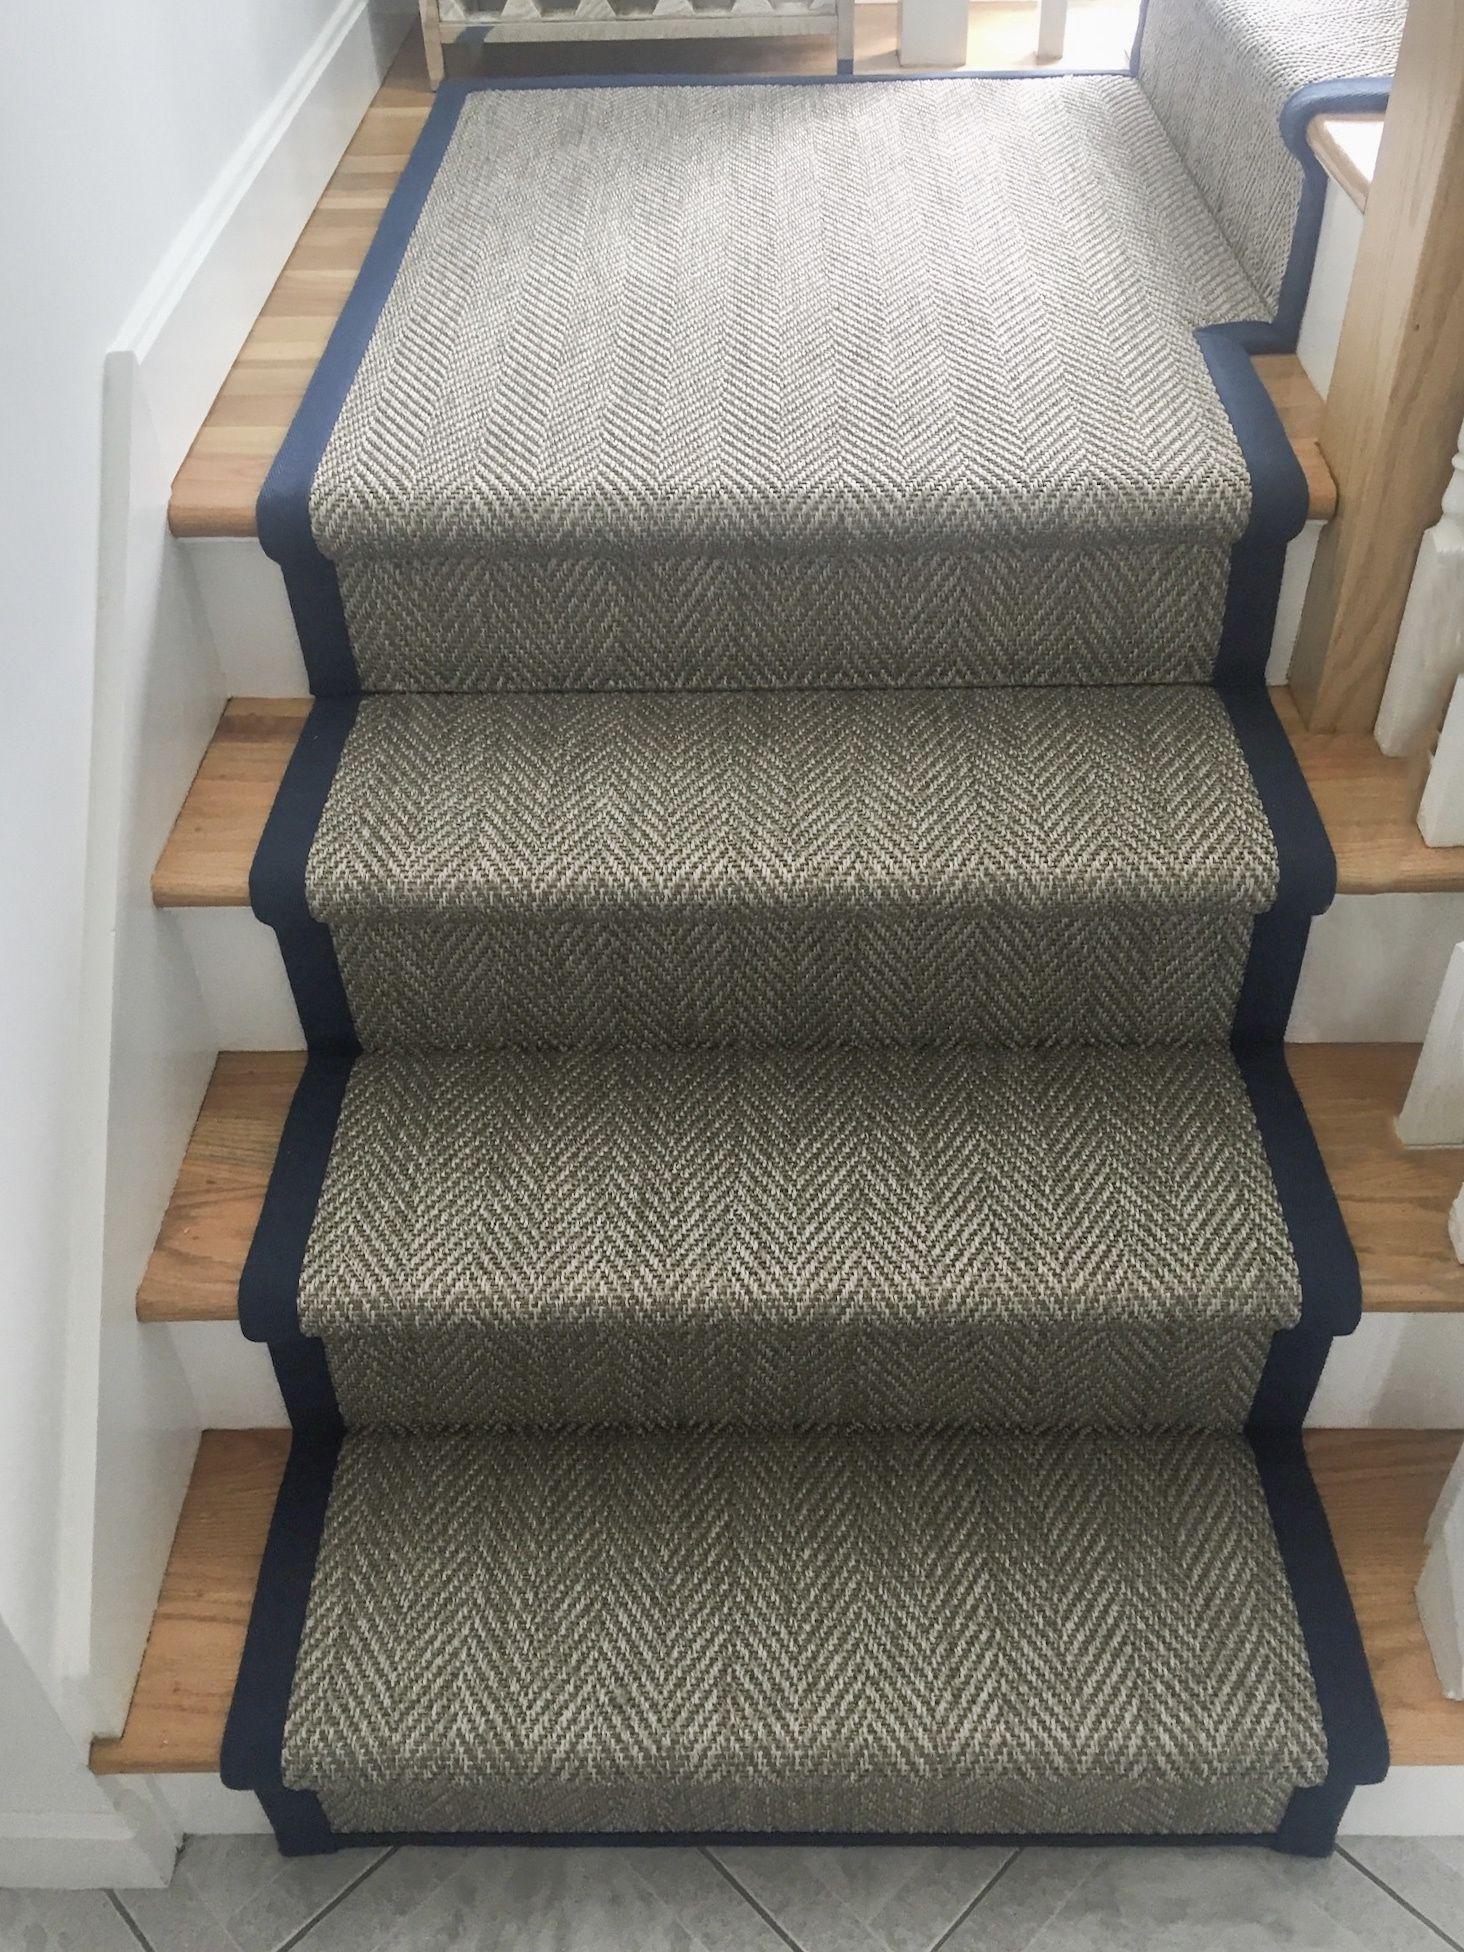 Indoor Outdoor Stair Runner With Navy Blue Wide Binding In 2020 Stair Runner Indoor Outdoor Carpet Outdoor Carpet